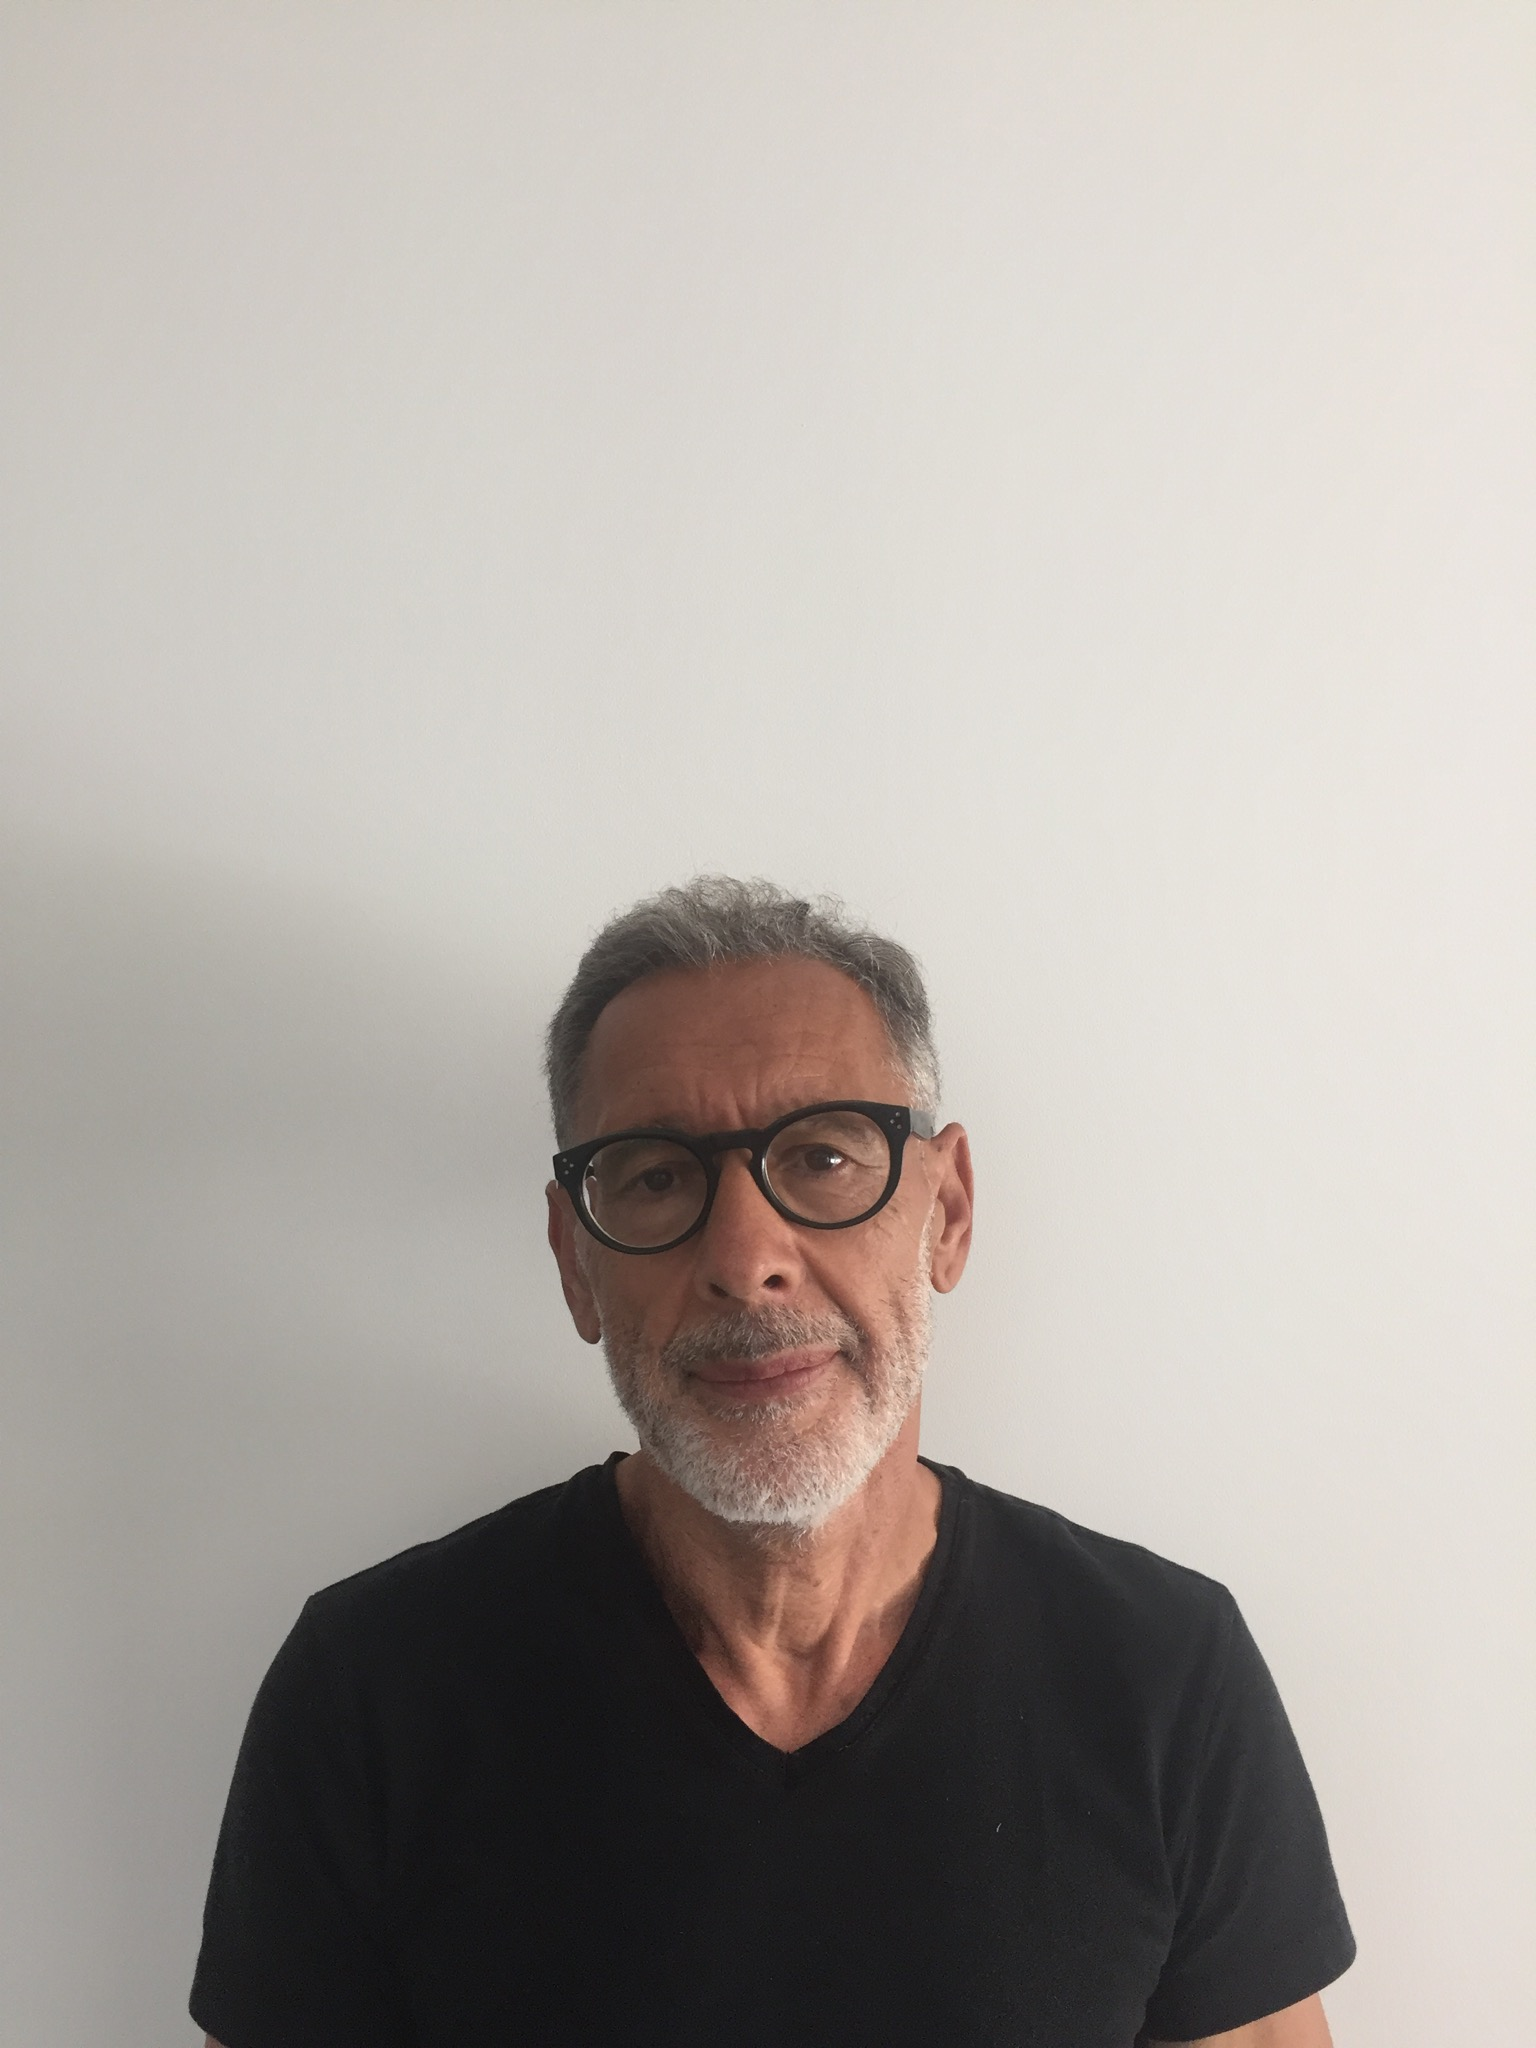 Mourad Zourdani